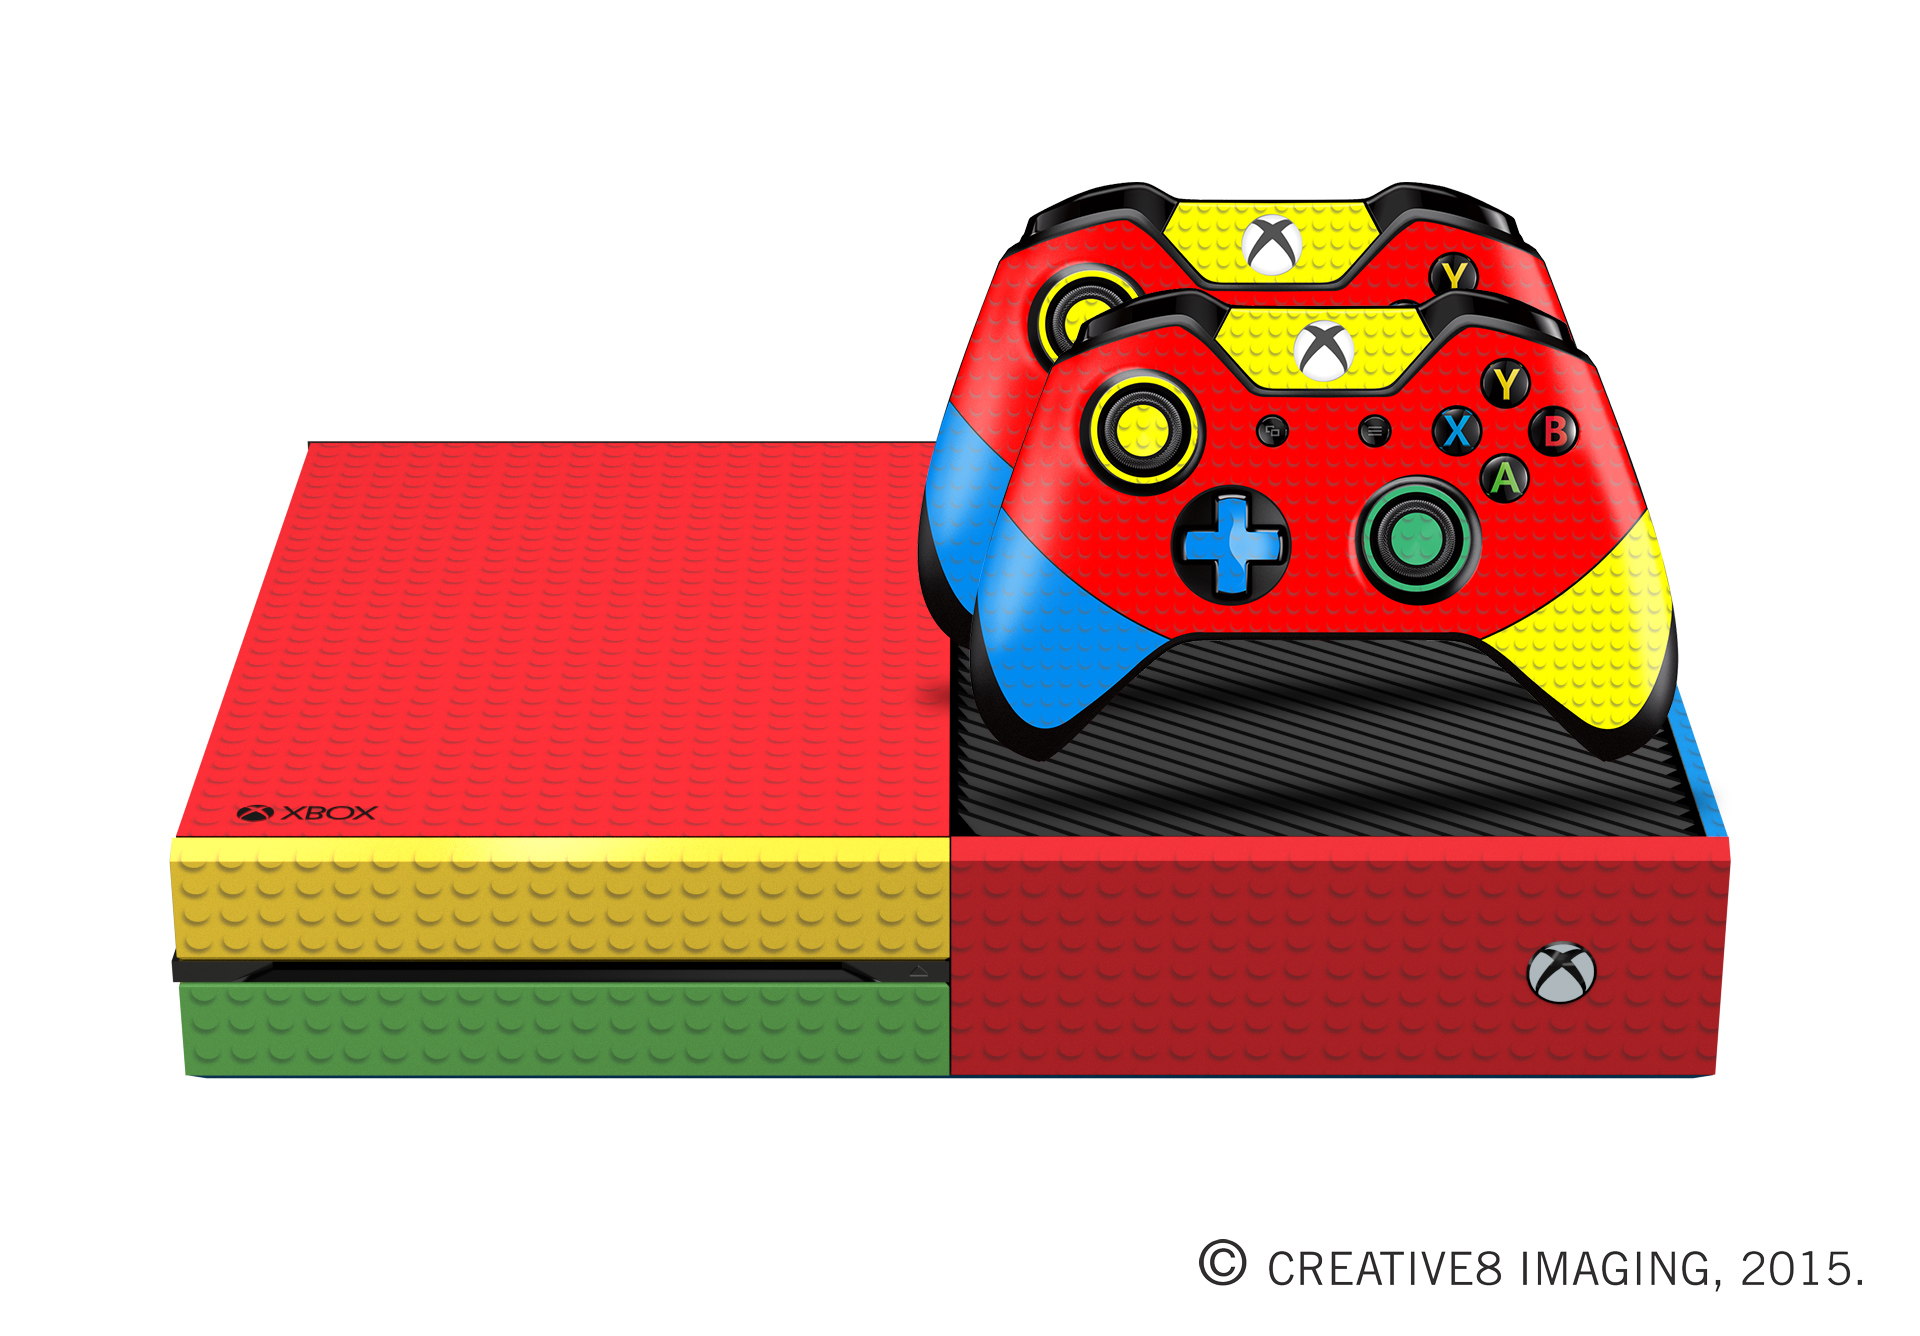 Home Decor Blog Names E Skins Xbox One Gaming Console Skin Brick Builders Block